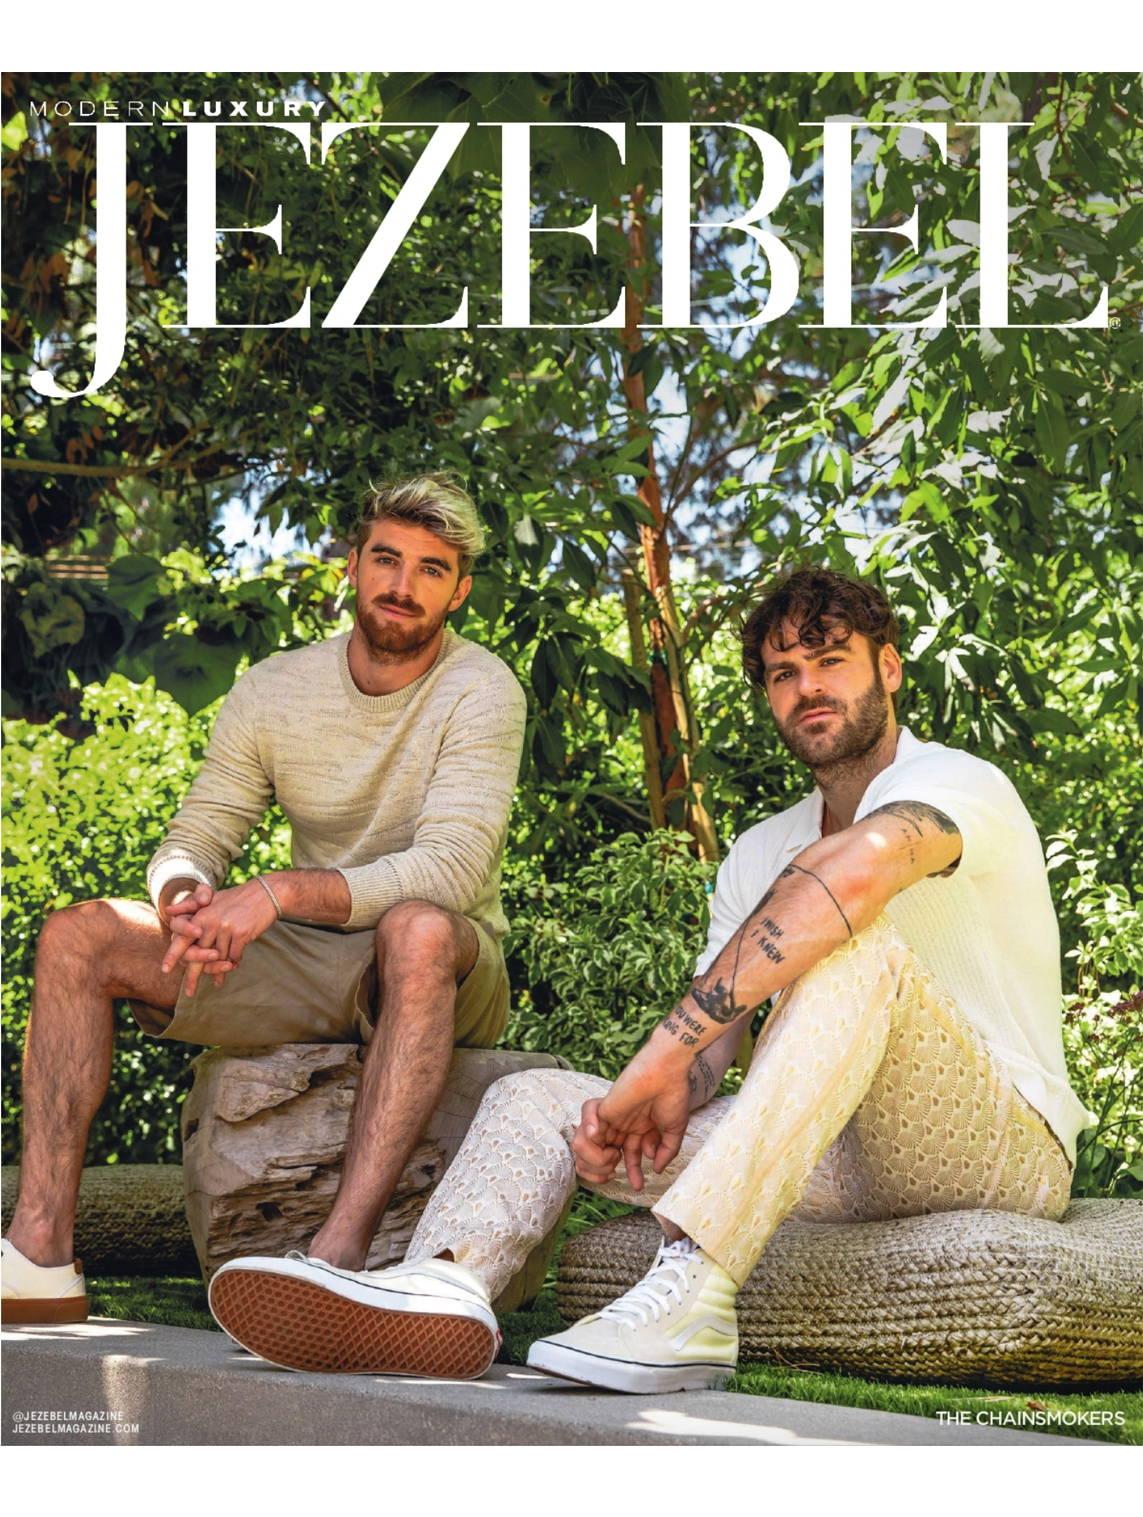 Jezebel Magazine Summer 2020 Issue Featuring Adelina Social Goods